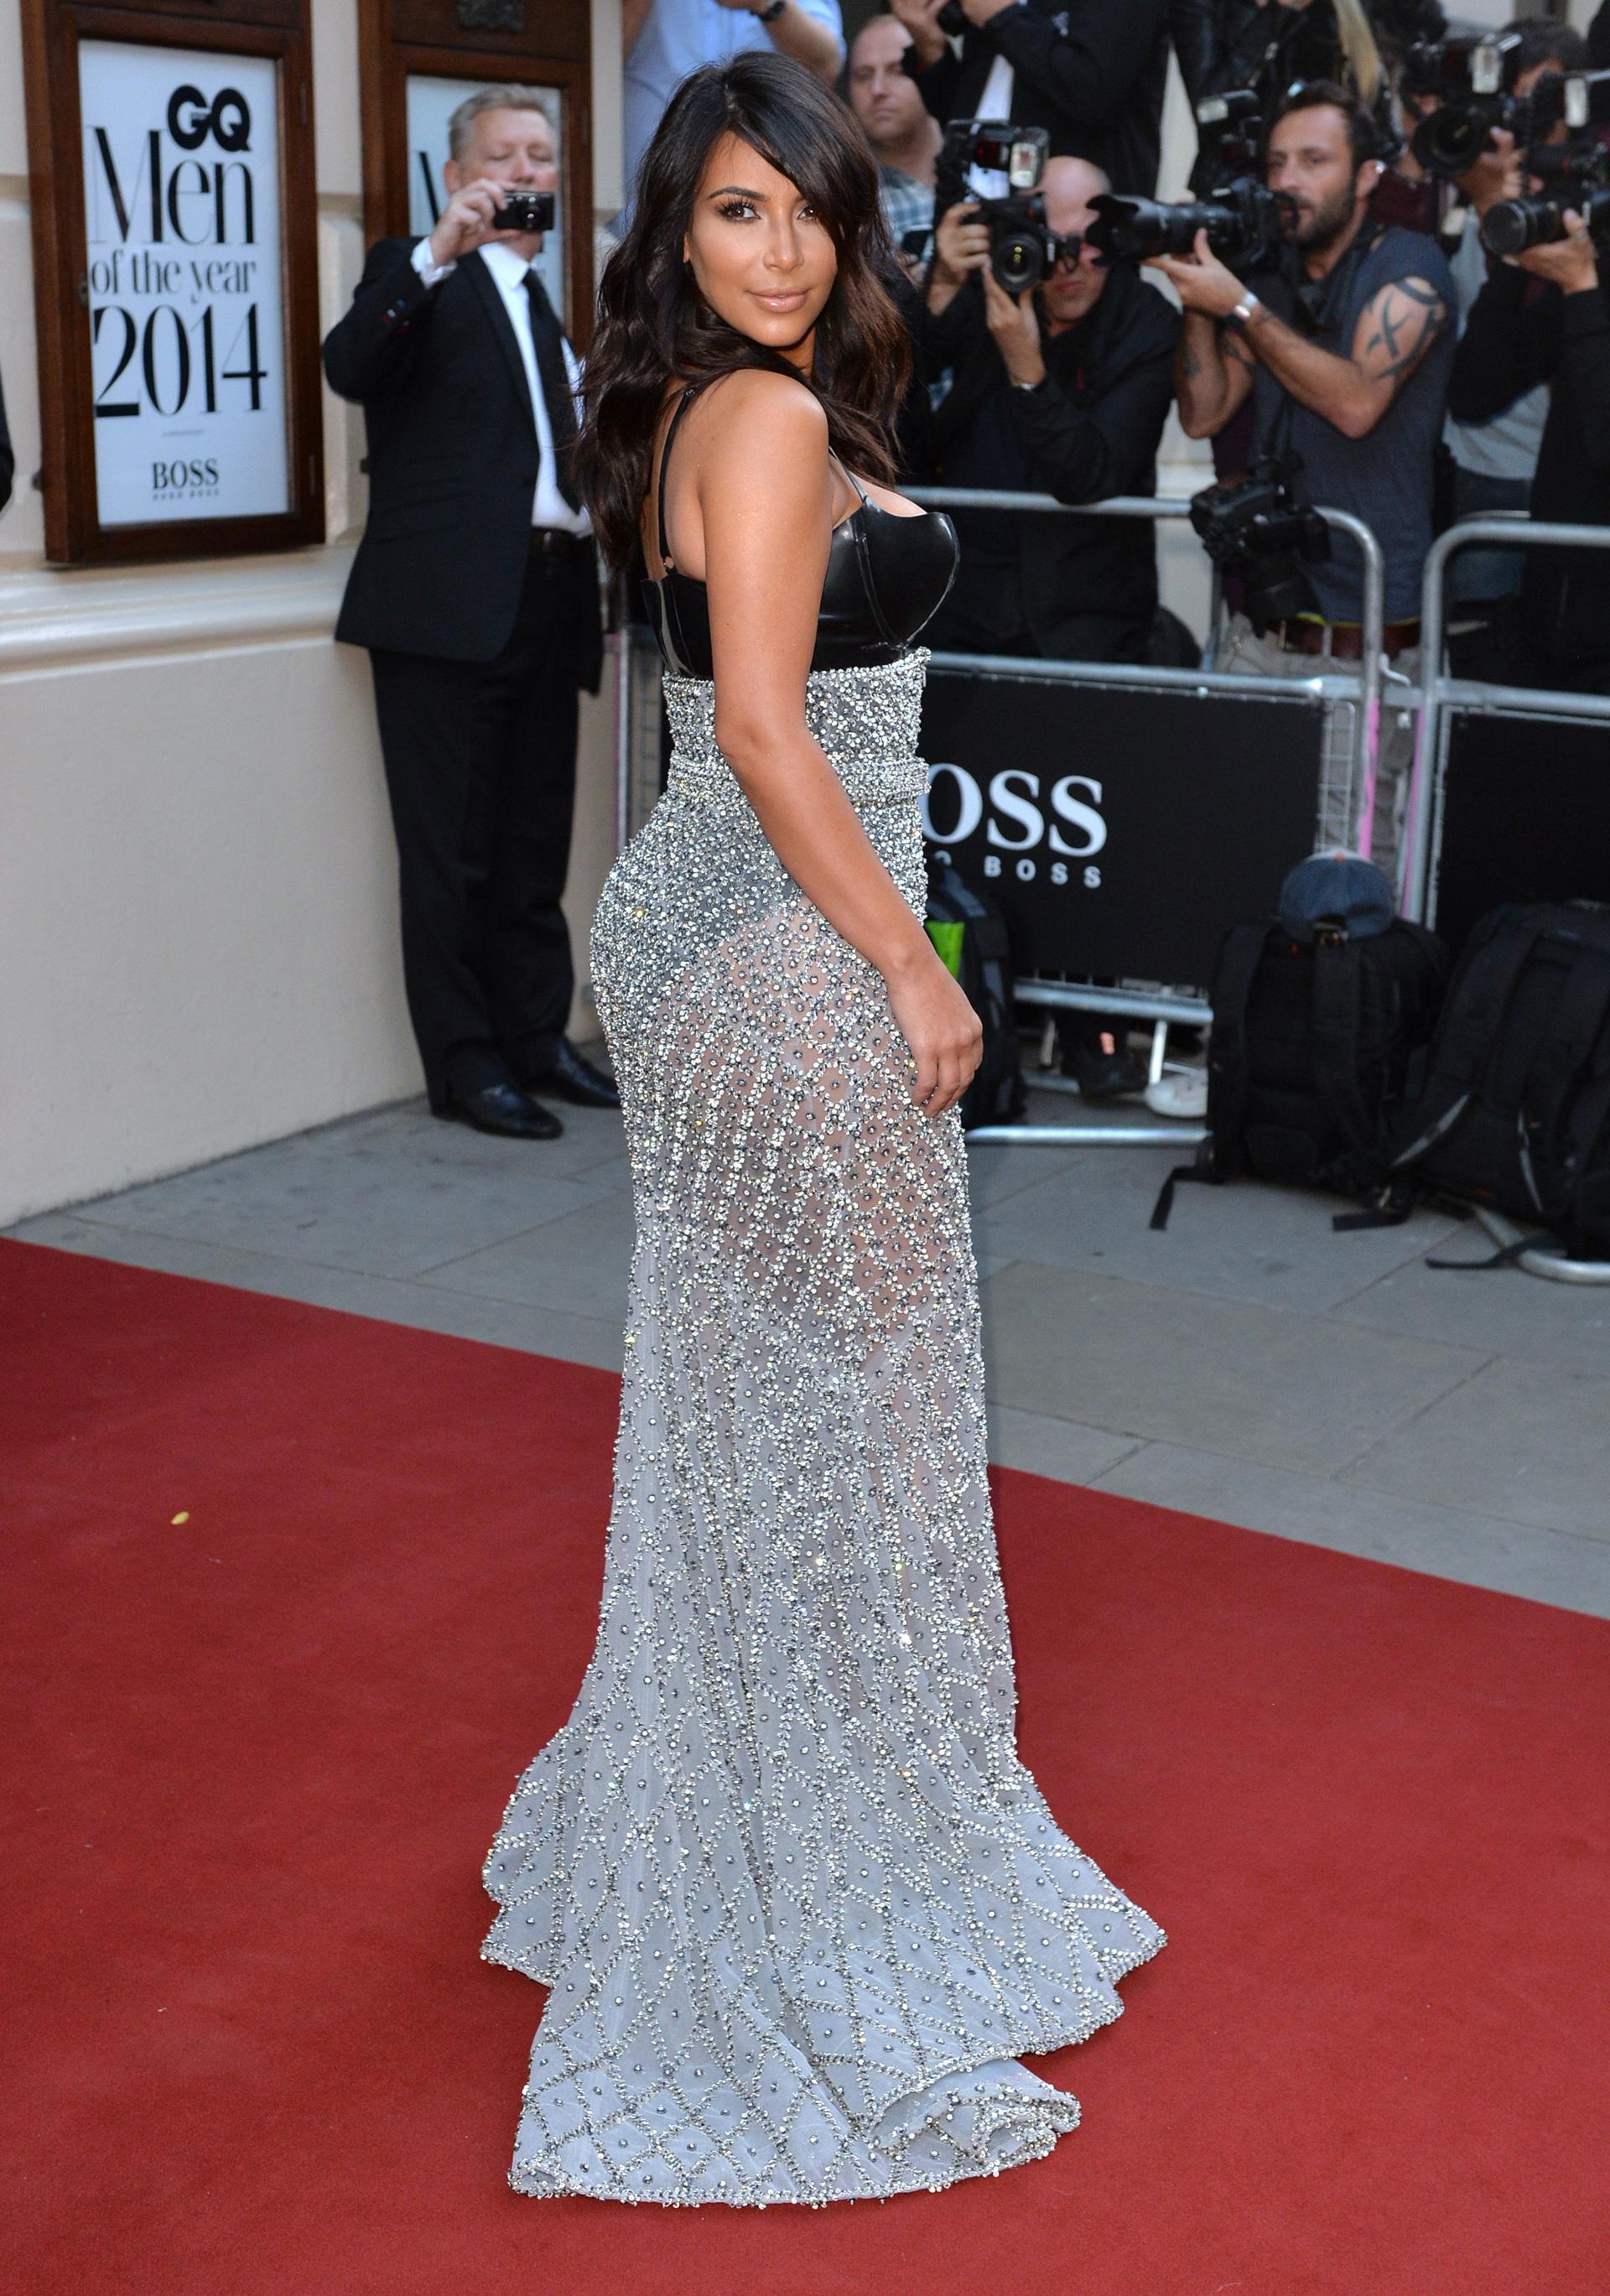 Kim Kardashian in a Ralph & Russo gown